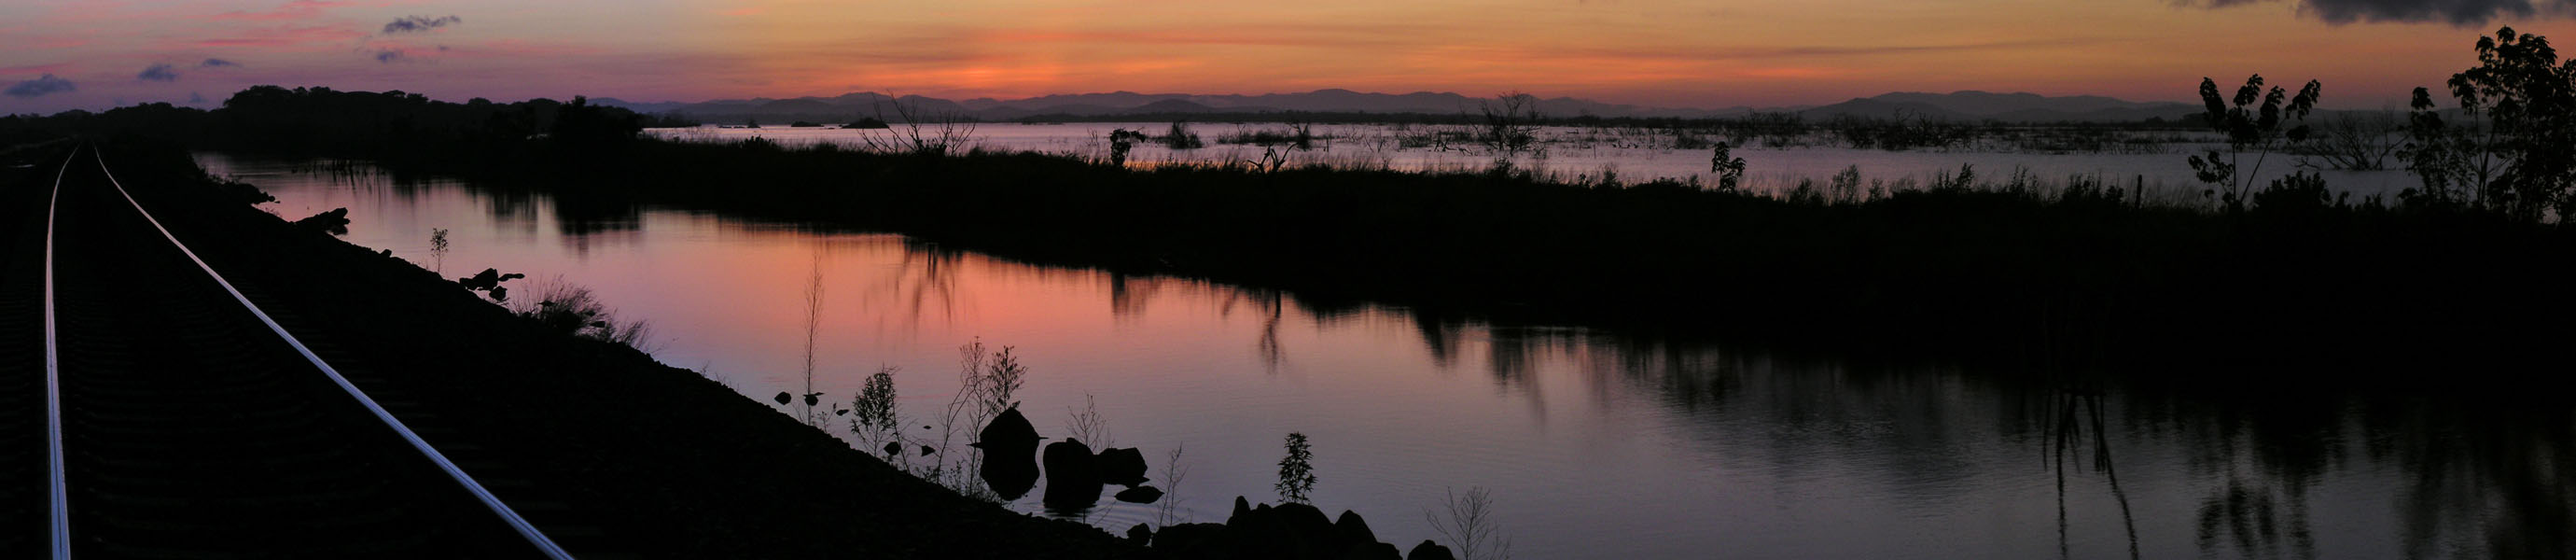 Pano, before sunrise / Antes del amanecer